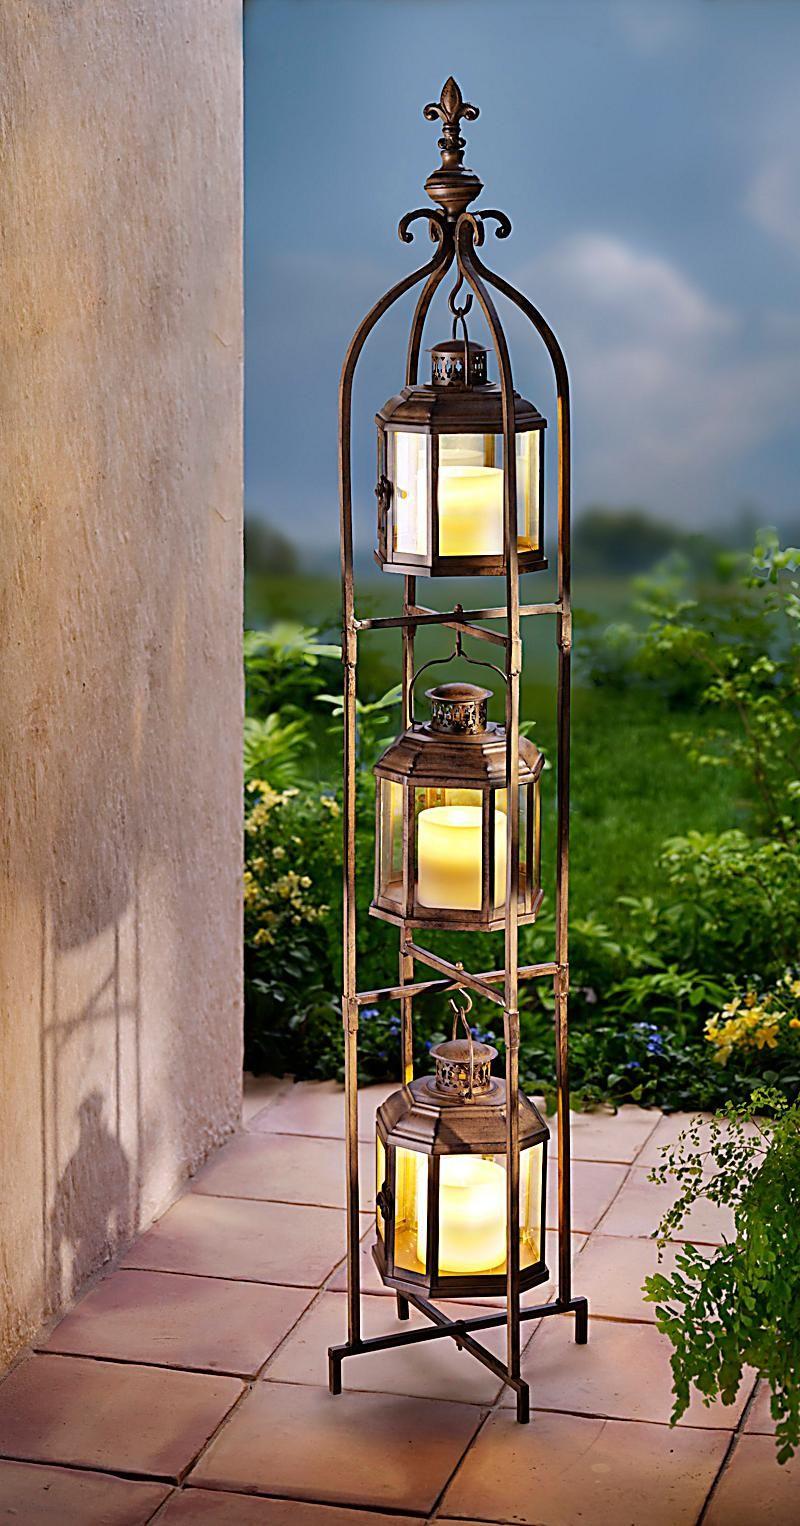 Laternen Trio Mit Led Kerzen Jetzt Bei Weltbild De Bestellen Dekorative Laternen Led Kerzen Hangende Laternen